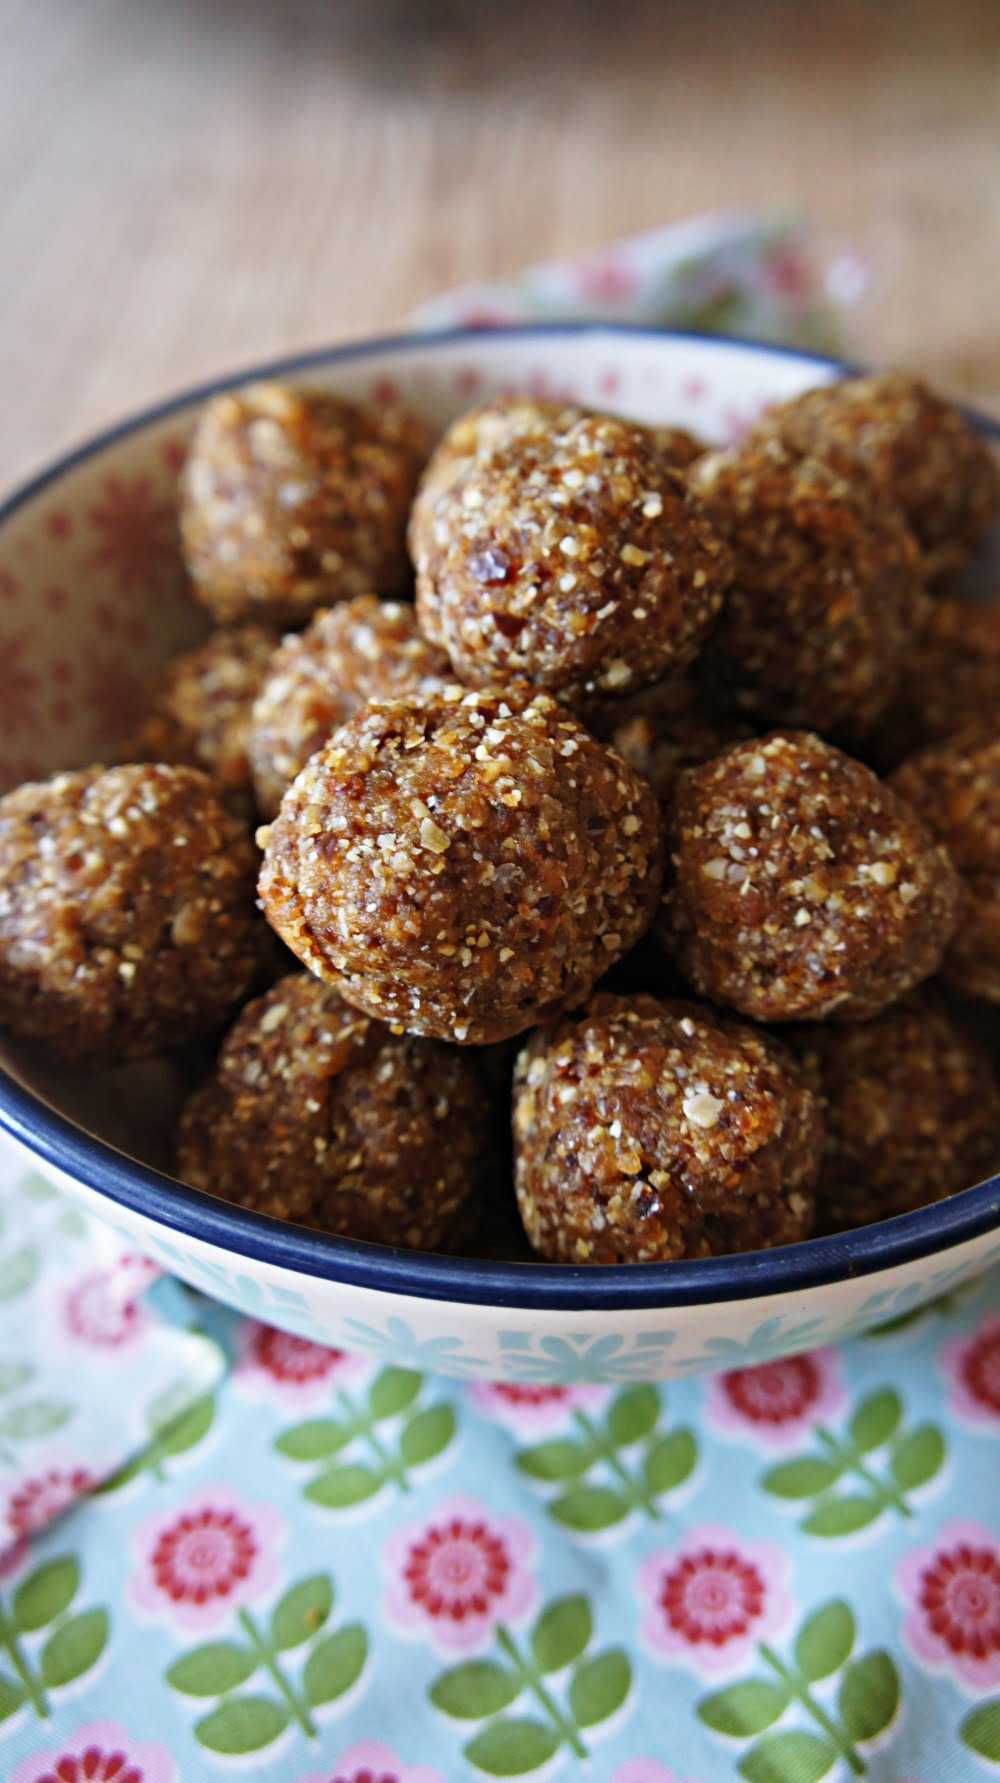 Receita de Energy Balls de Amendoim